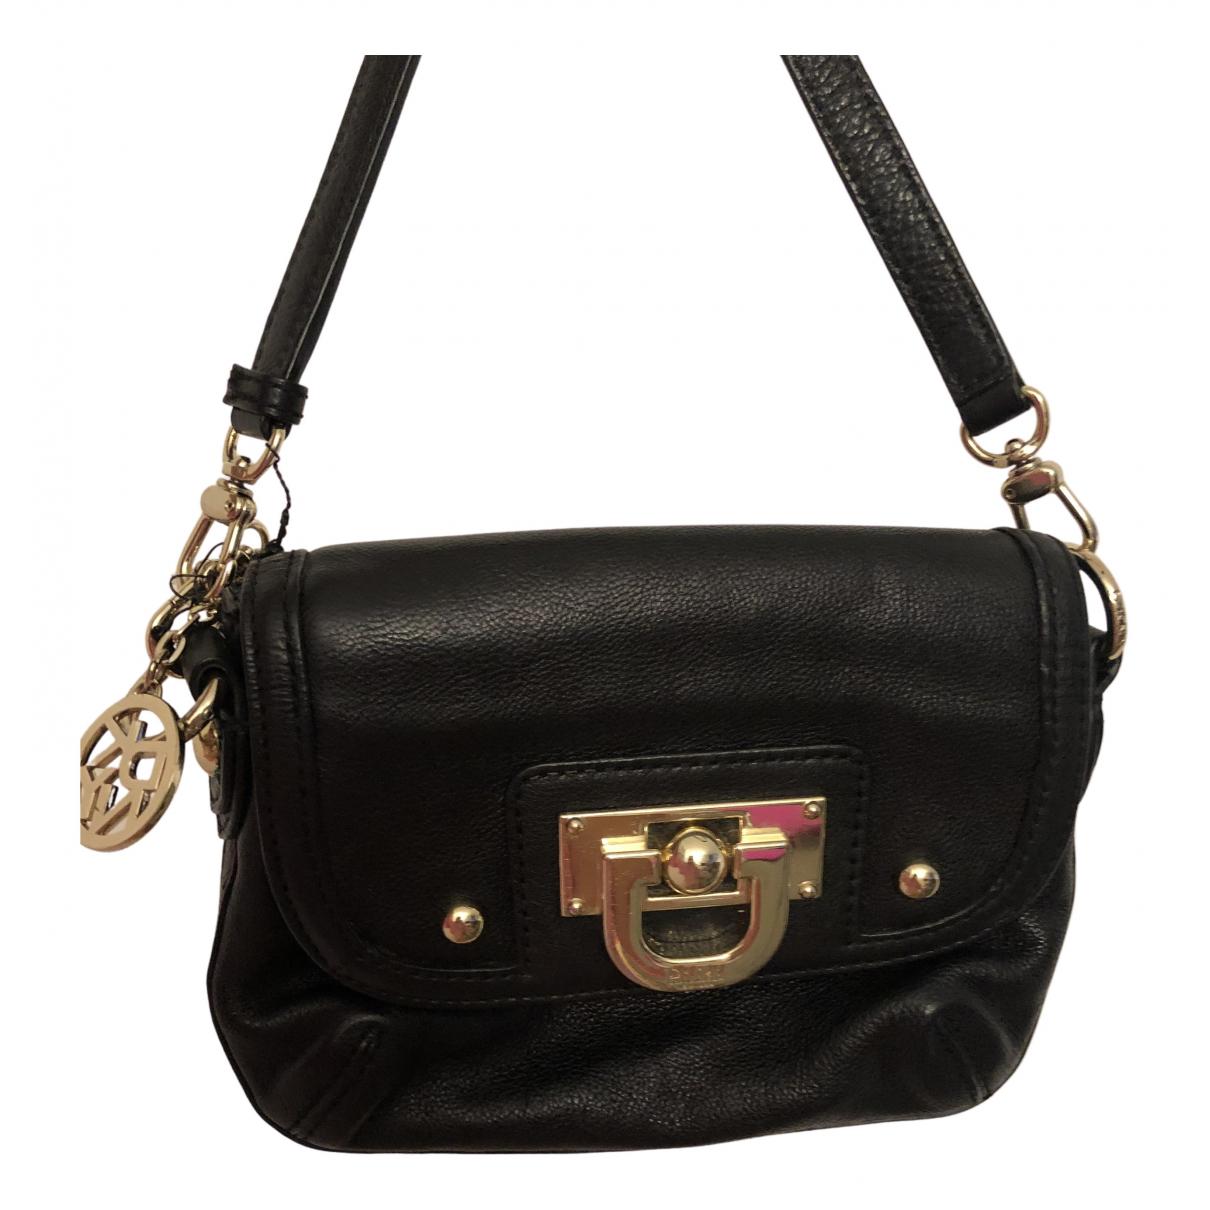 Dkny N Black Leather handbag for Women N